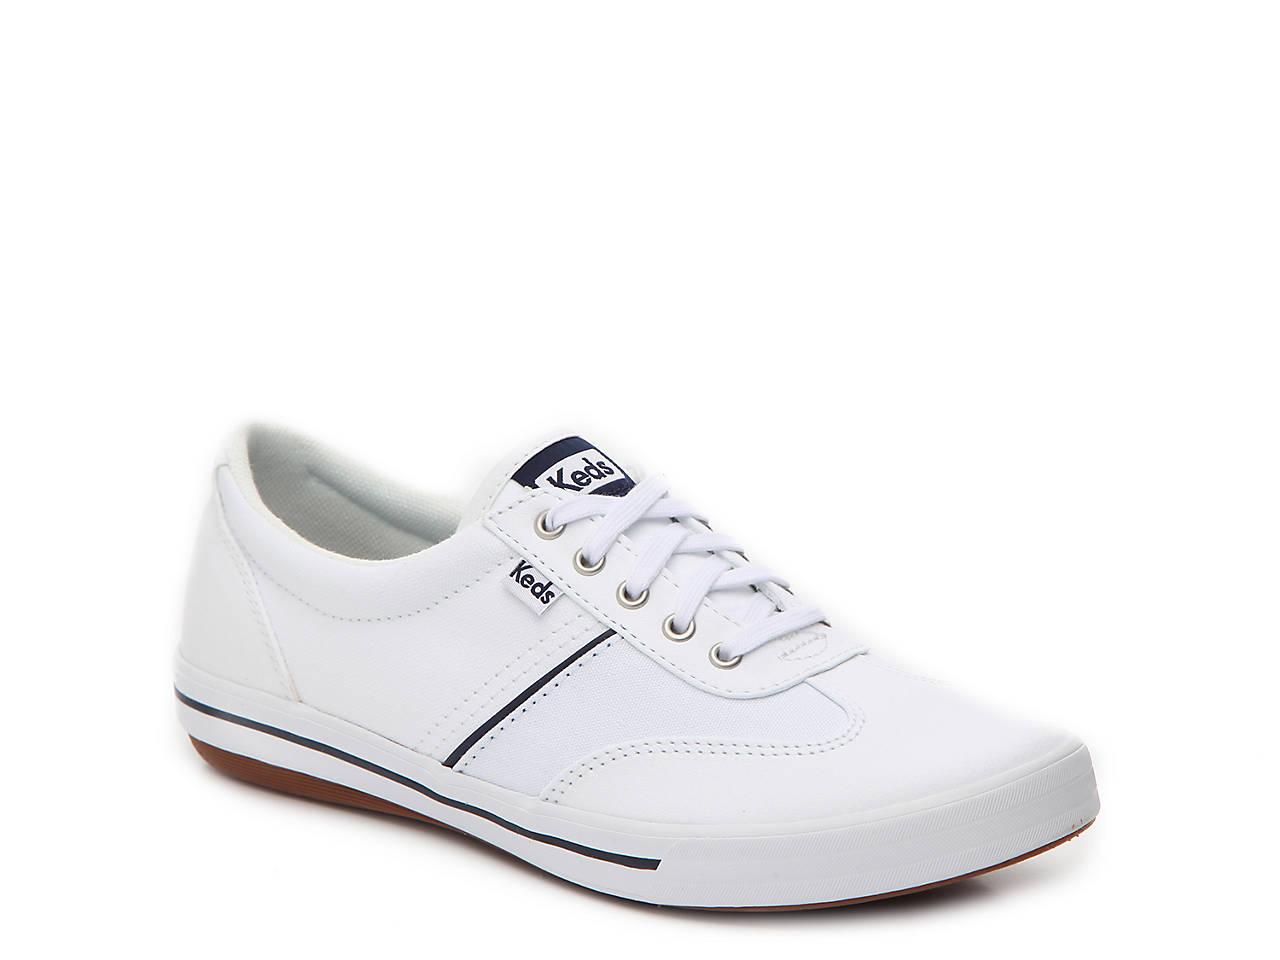 31f6bb1f9f0b Keds Craze II Sneaker - Women s Women s Shoes